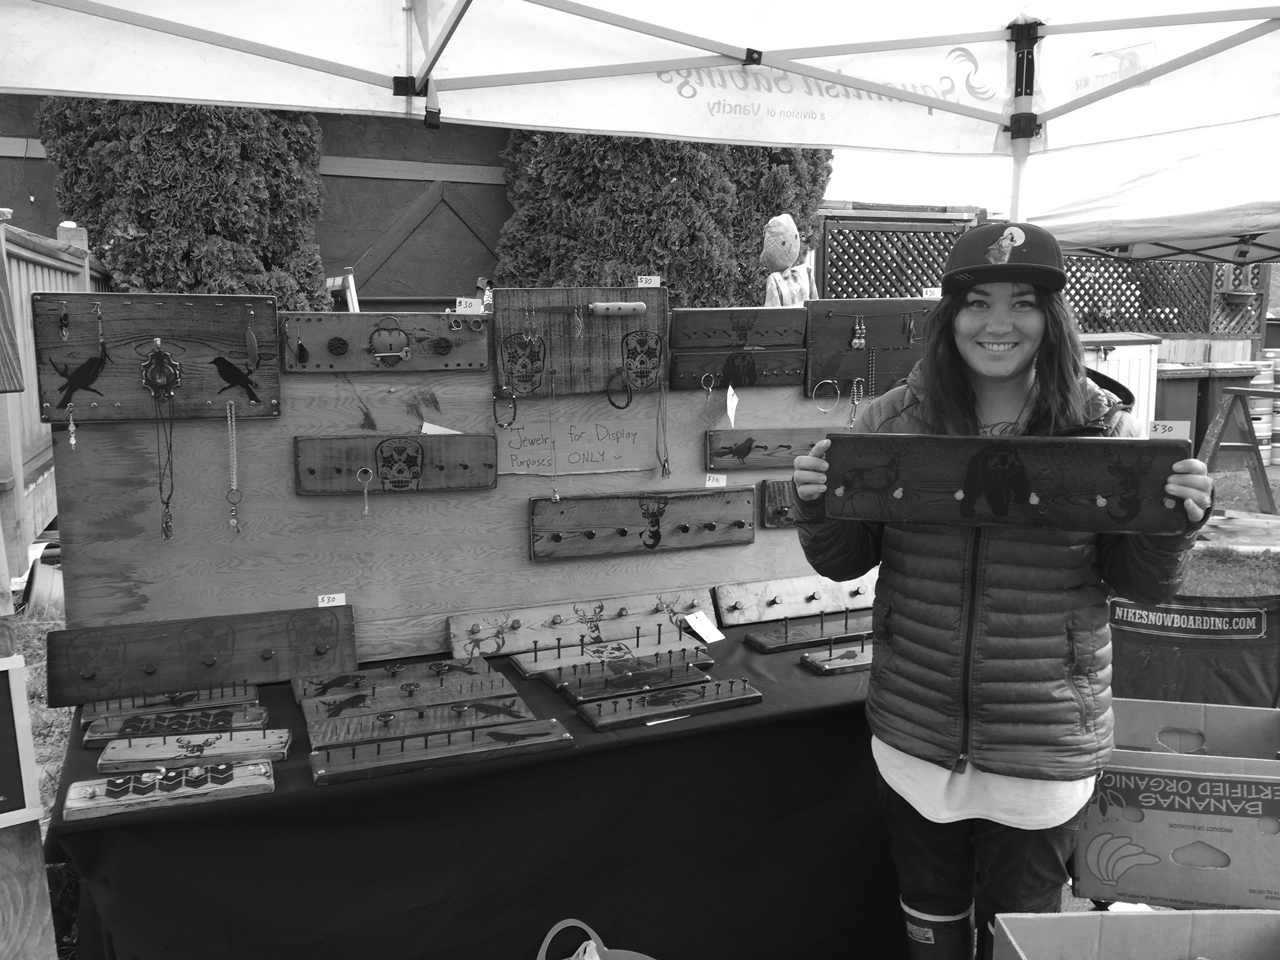 Jess Kimura treibt sich auch gerne mal auf dem Farmer's Market rum | © Jess Kimura